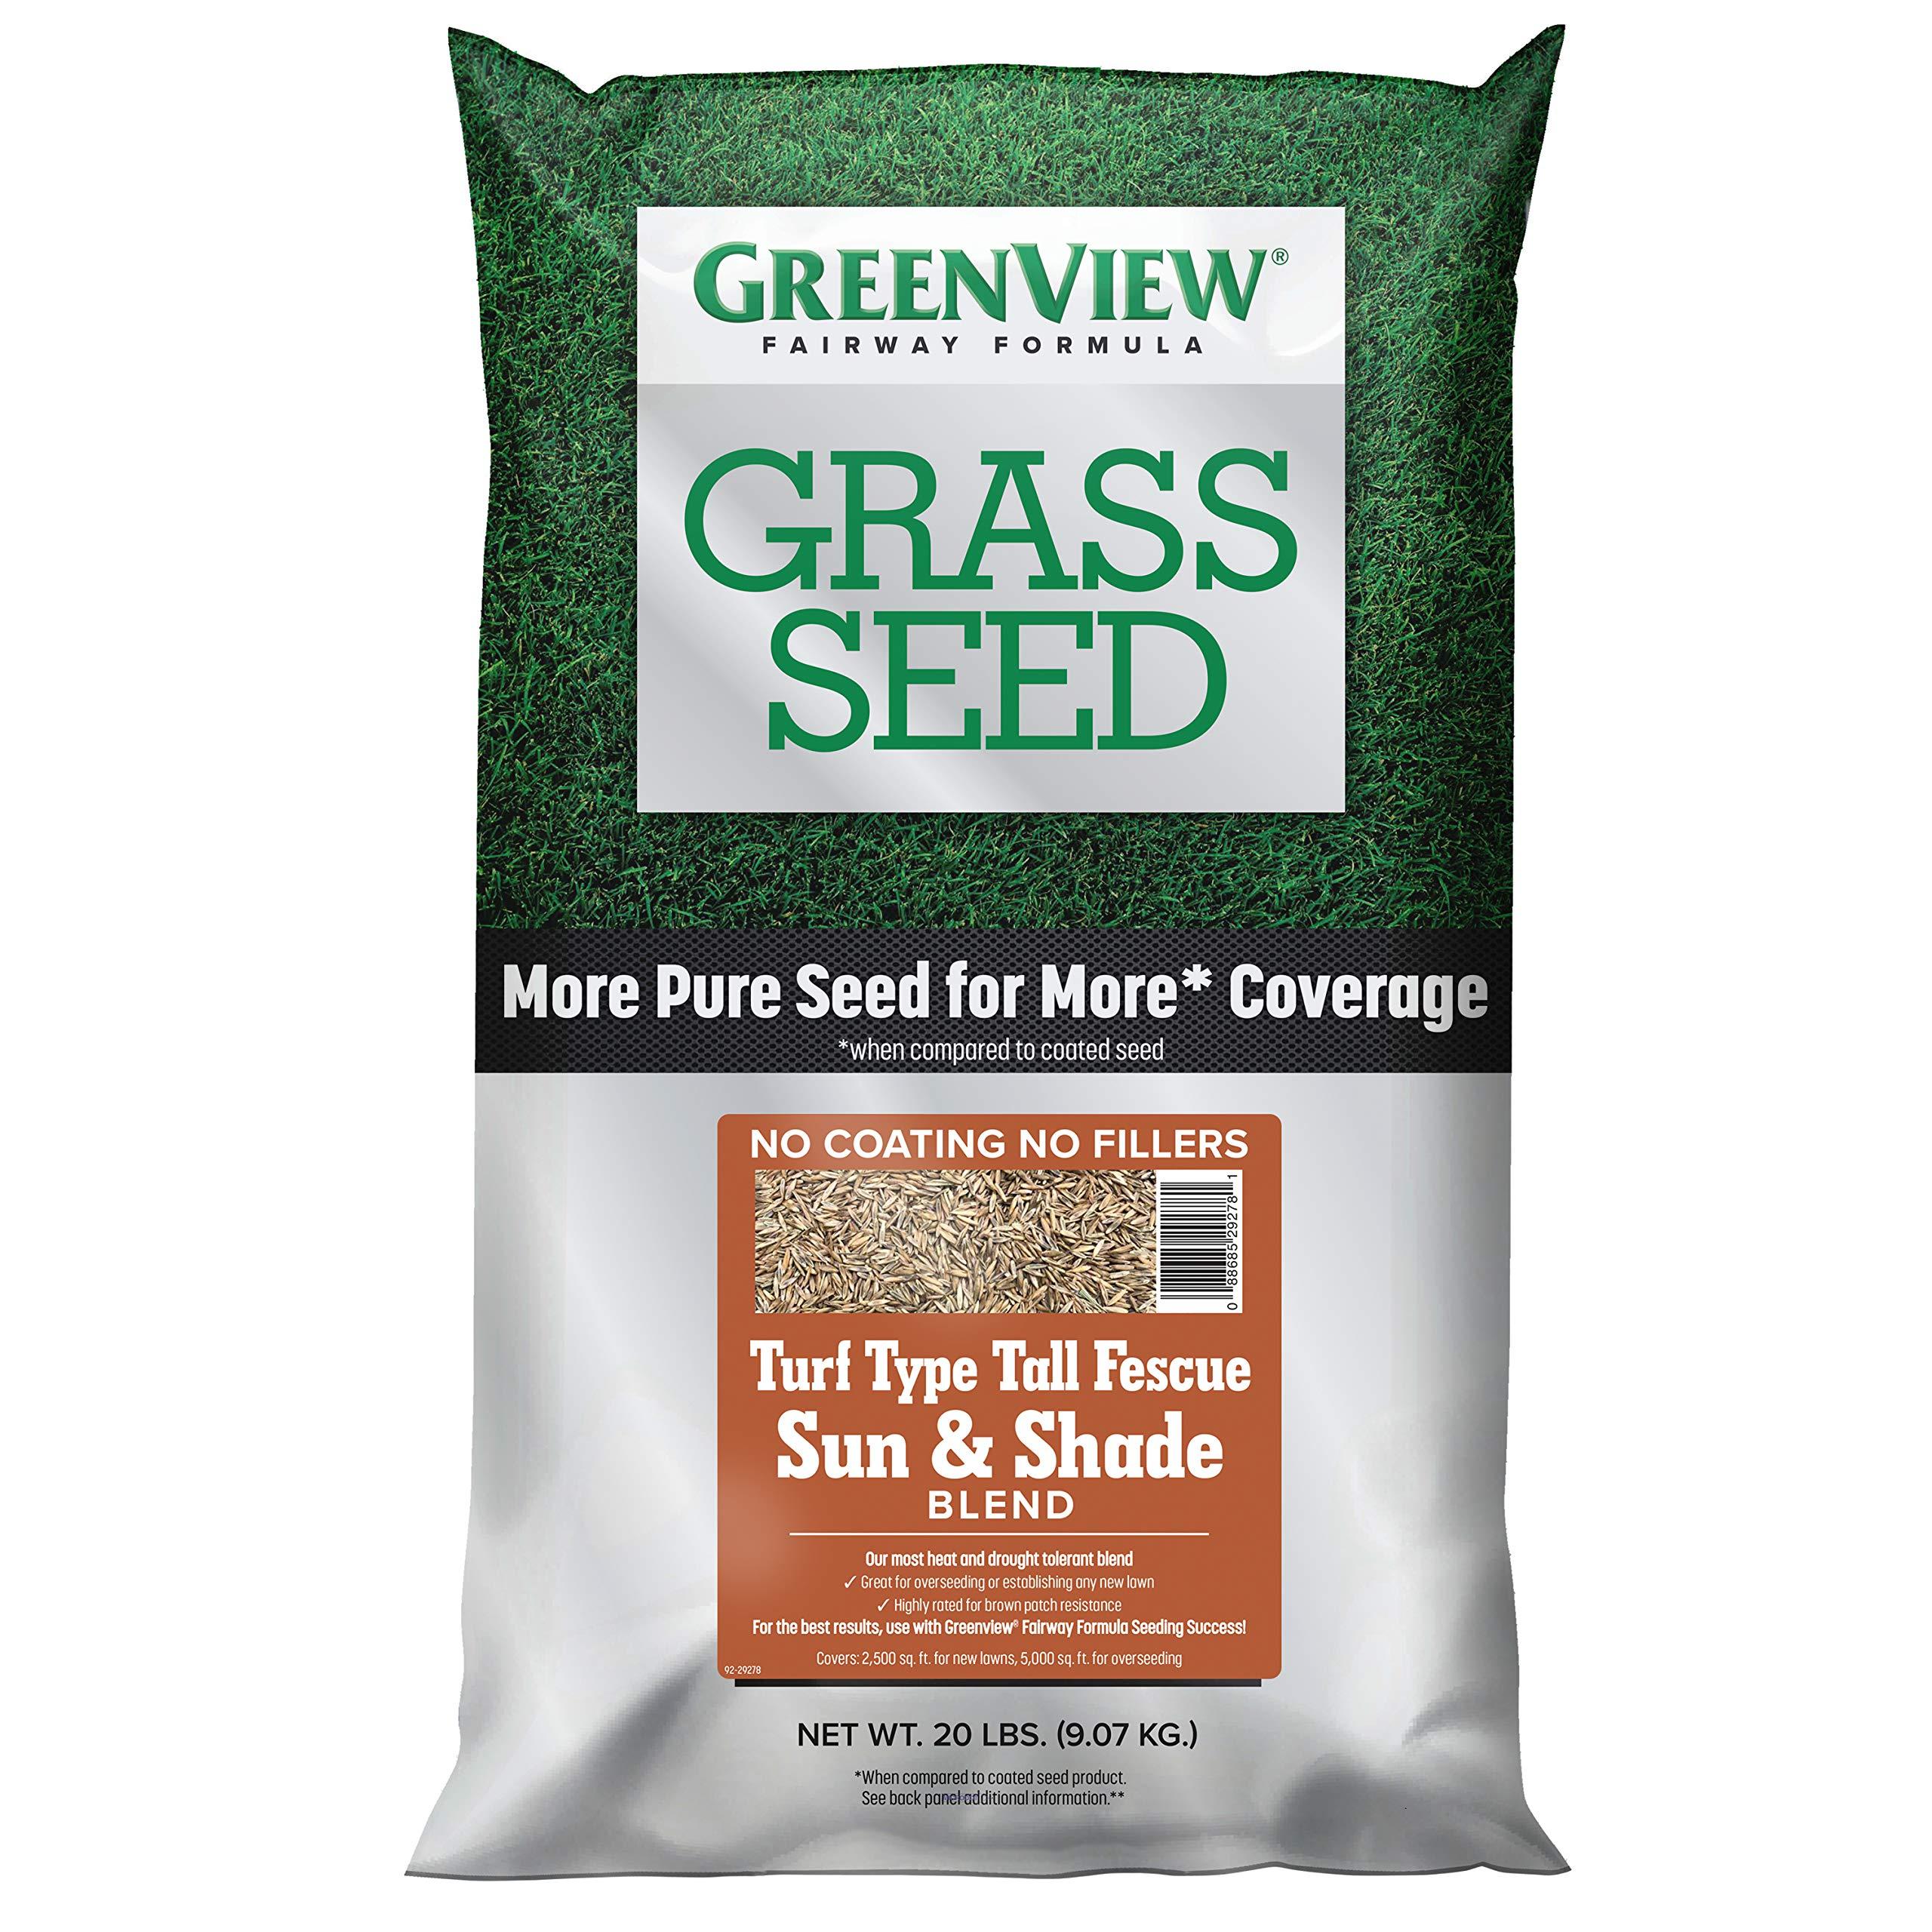 GreenView 2829348 Fairway Formula Grass Seed Turf Type Tall Fescue, Sun & Shade Blend, 20 lb.